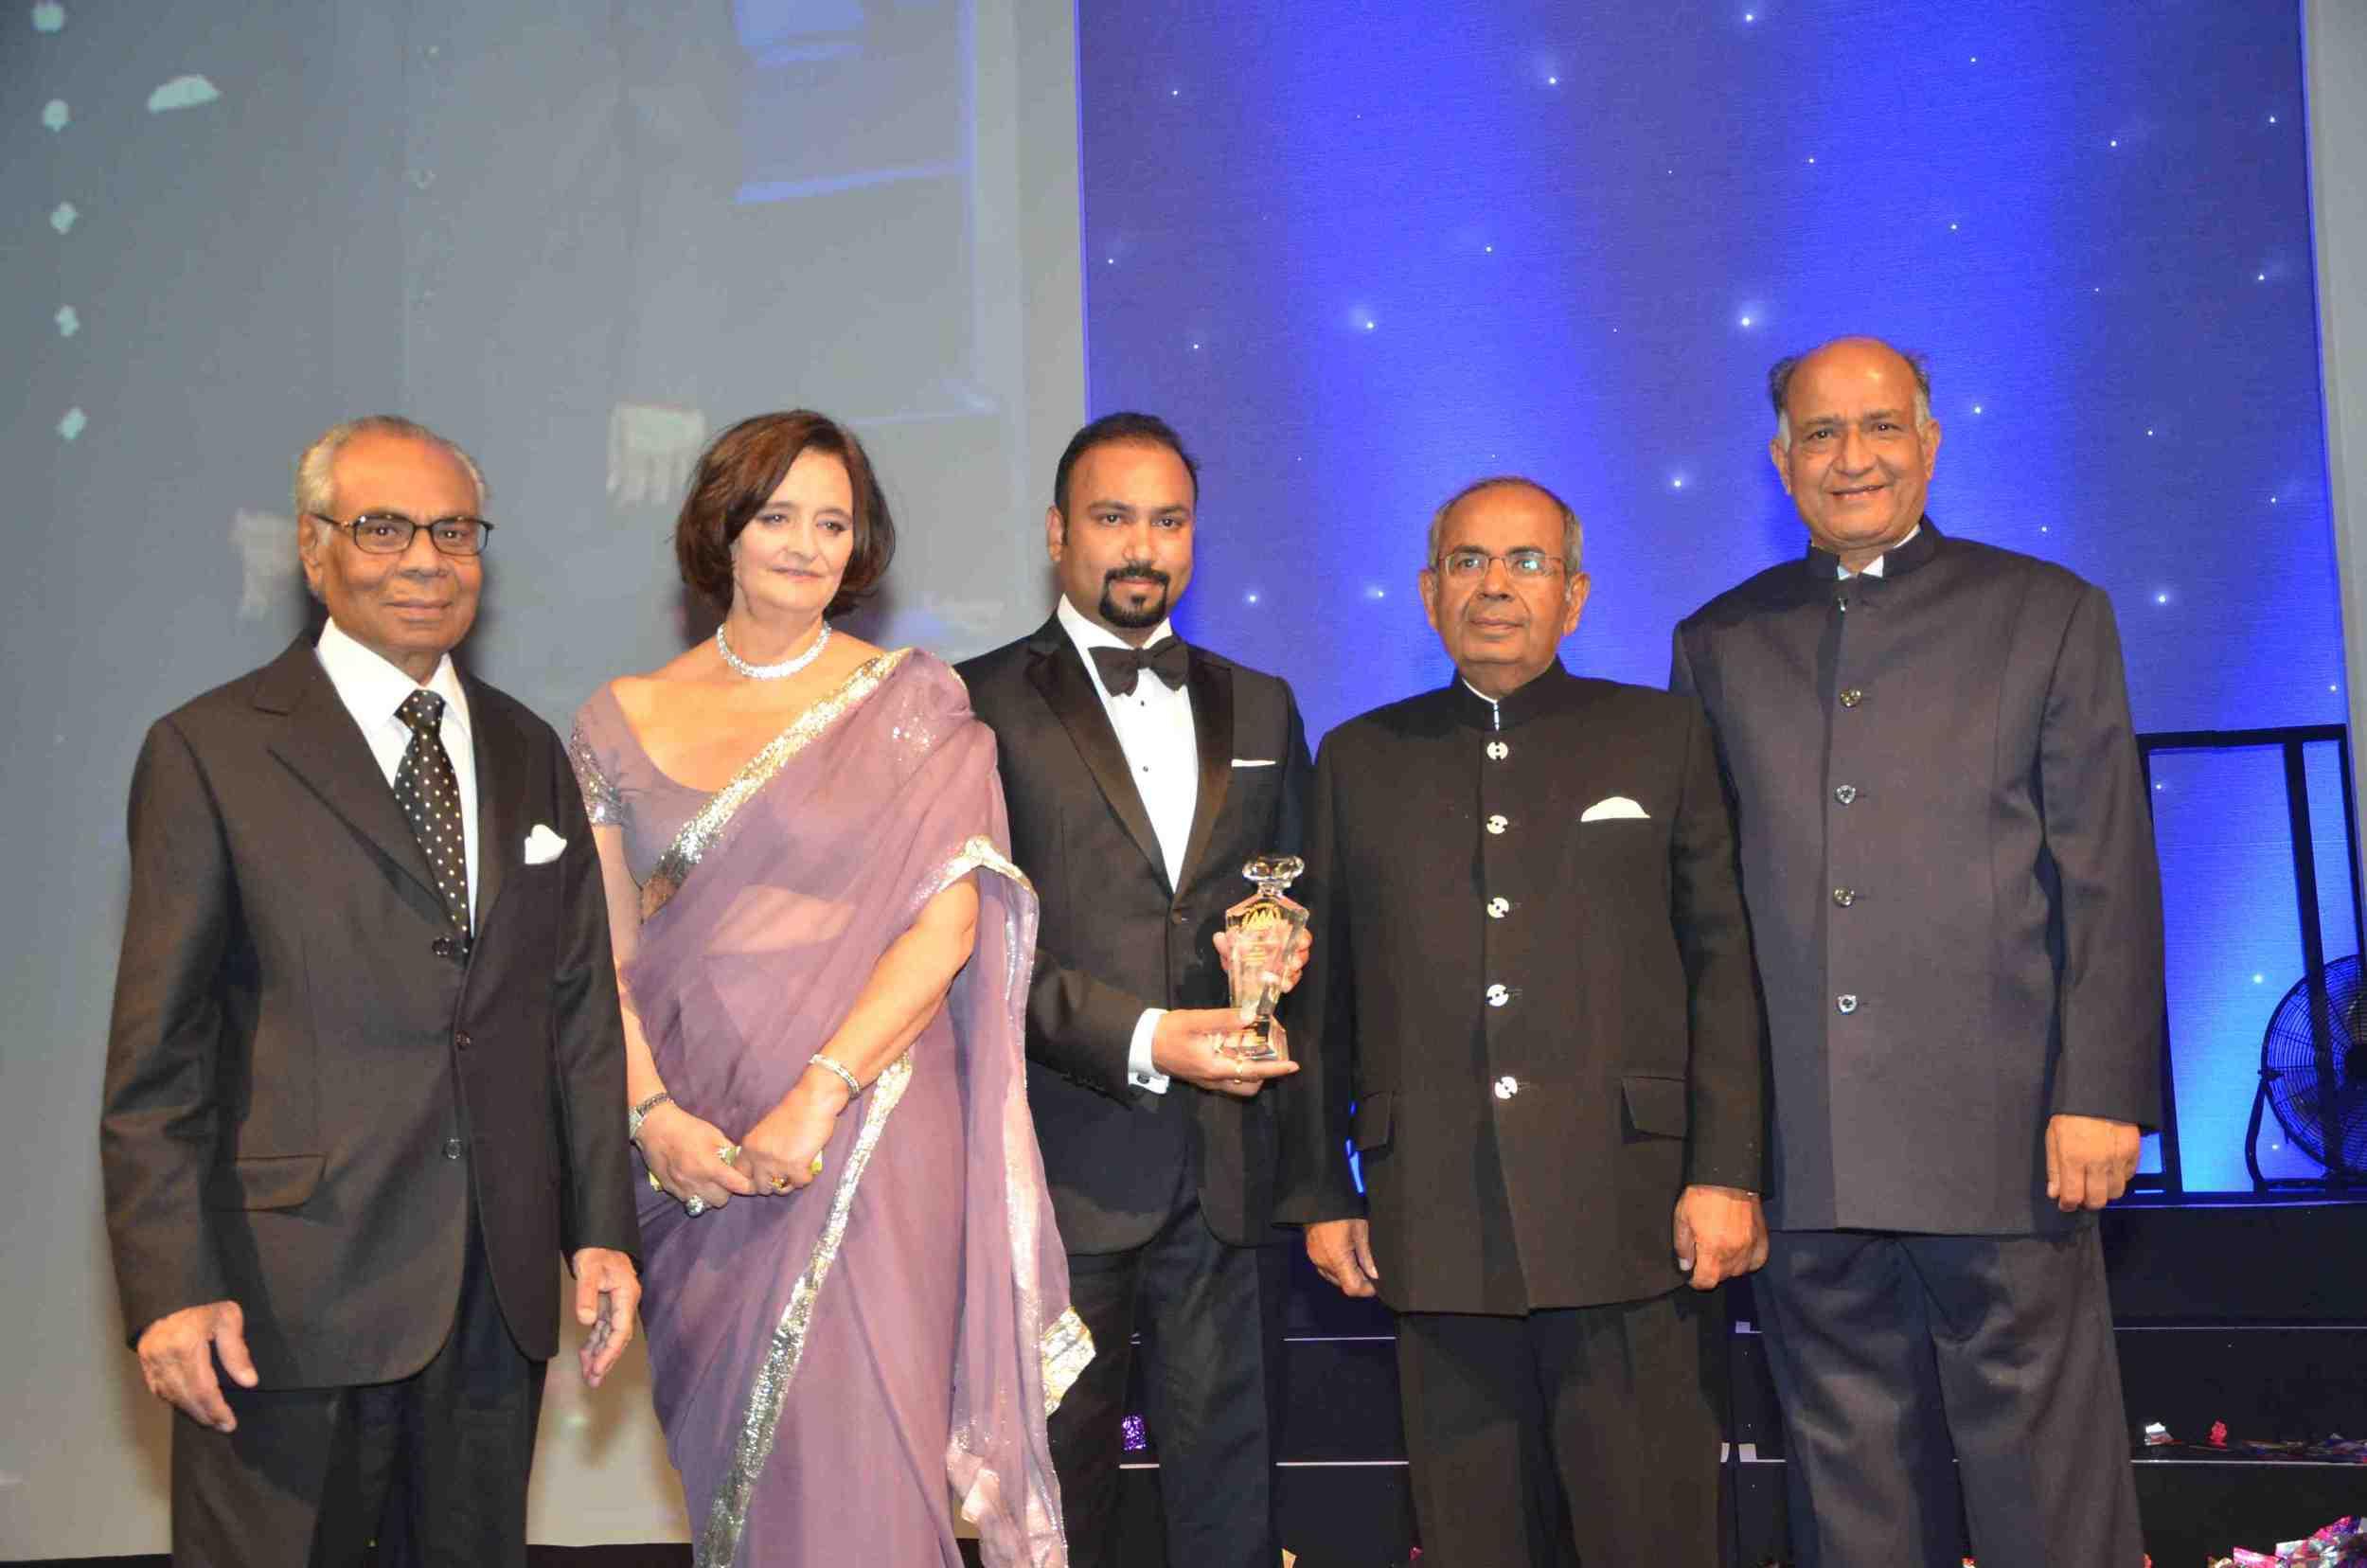 Srichand Hinduja; Cherie Blair CBE, QC; Subaskaran Allirajah; Gopichand Hinduja;  CB Patel